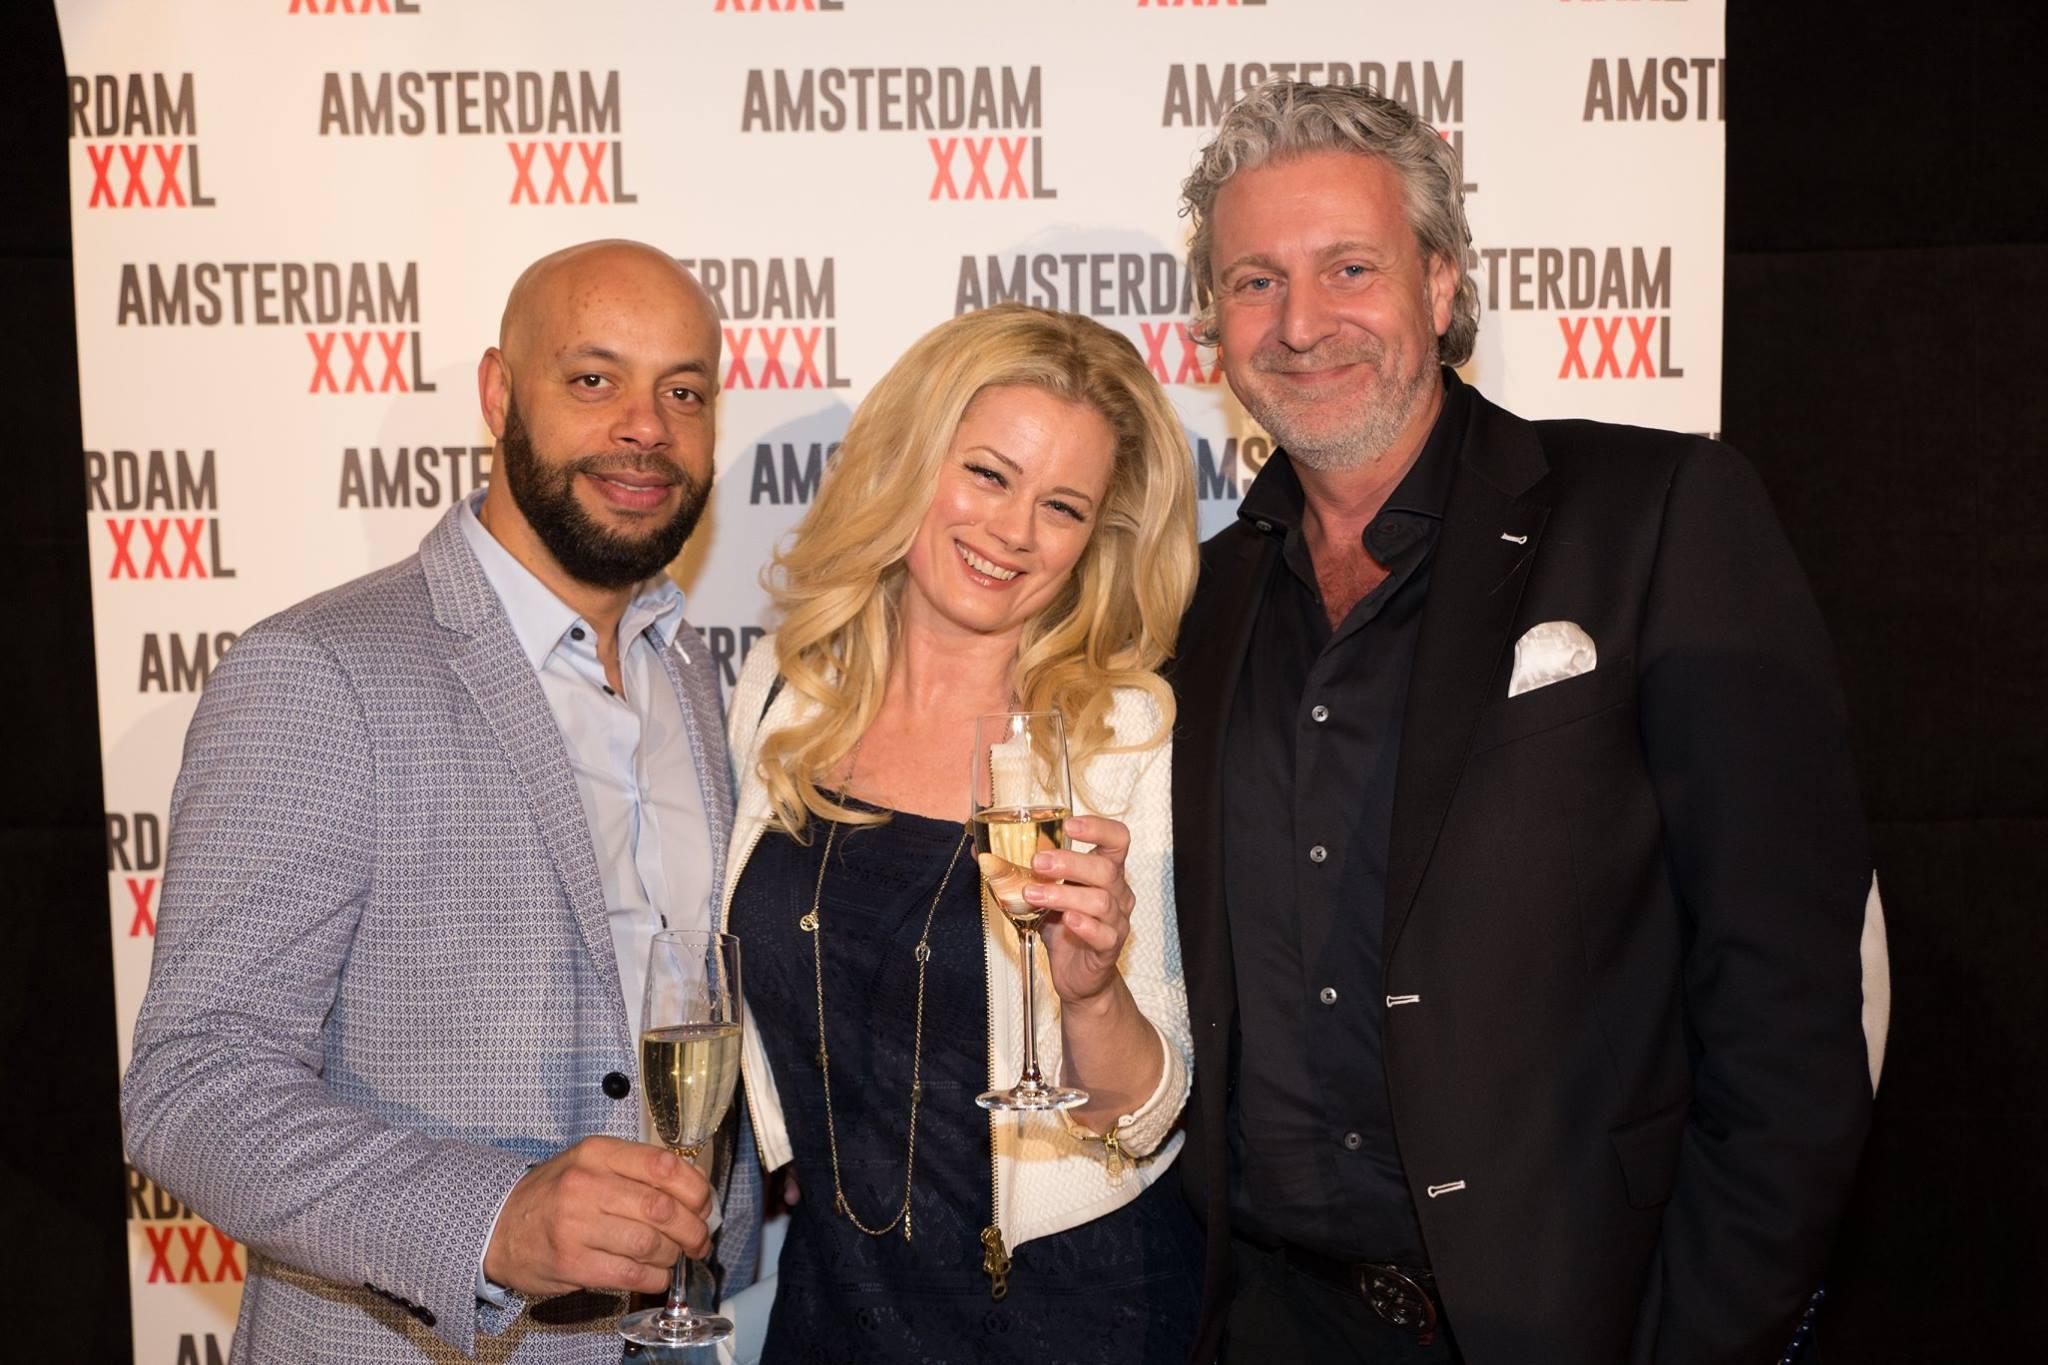 Mark Teurlings Amsterdam XXL